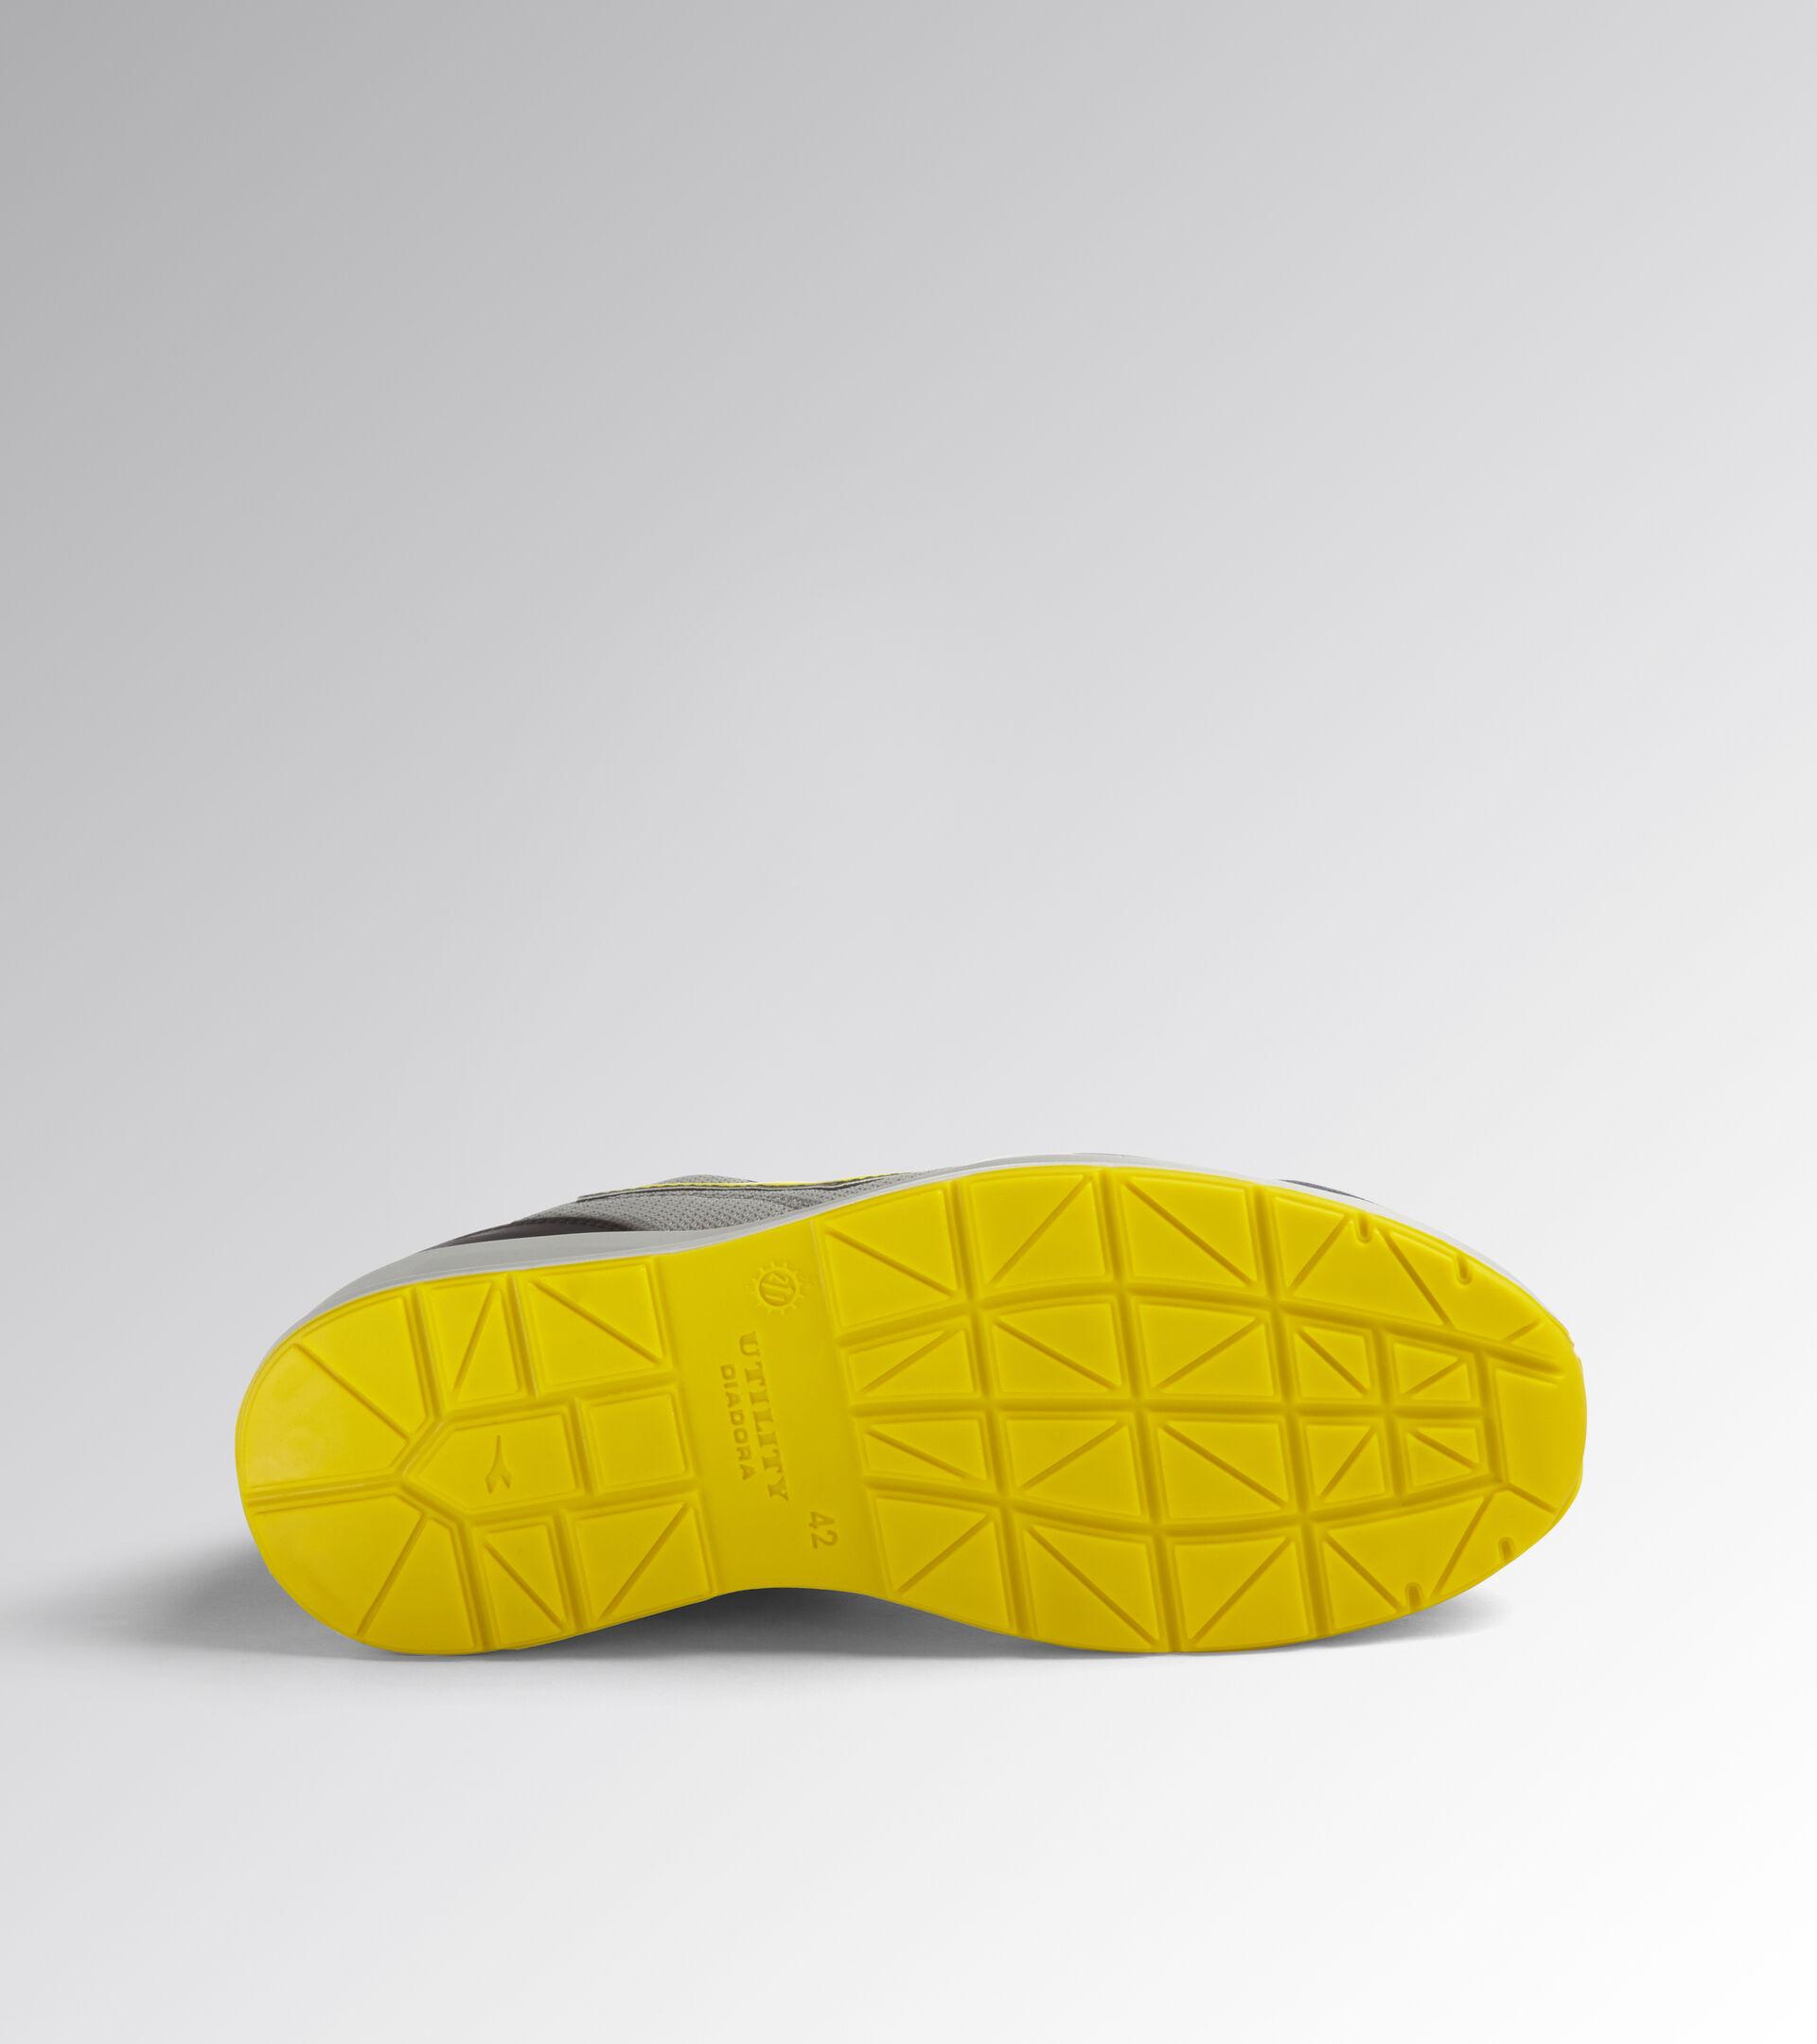 Footwear Utility UNISEX RUN NET AIRBOX LOW S1P SRC BLUE COSMOS/MOON ROCK GRAY Utility